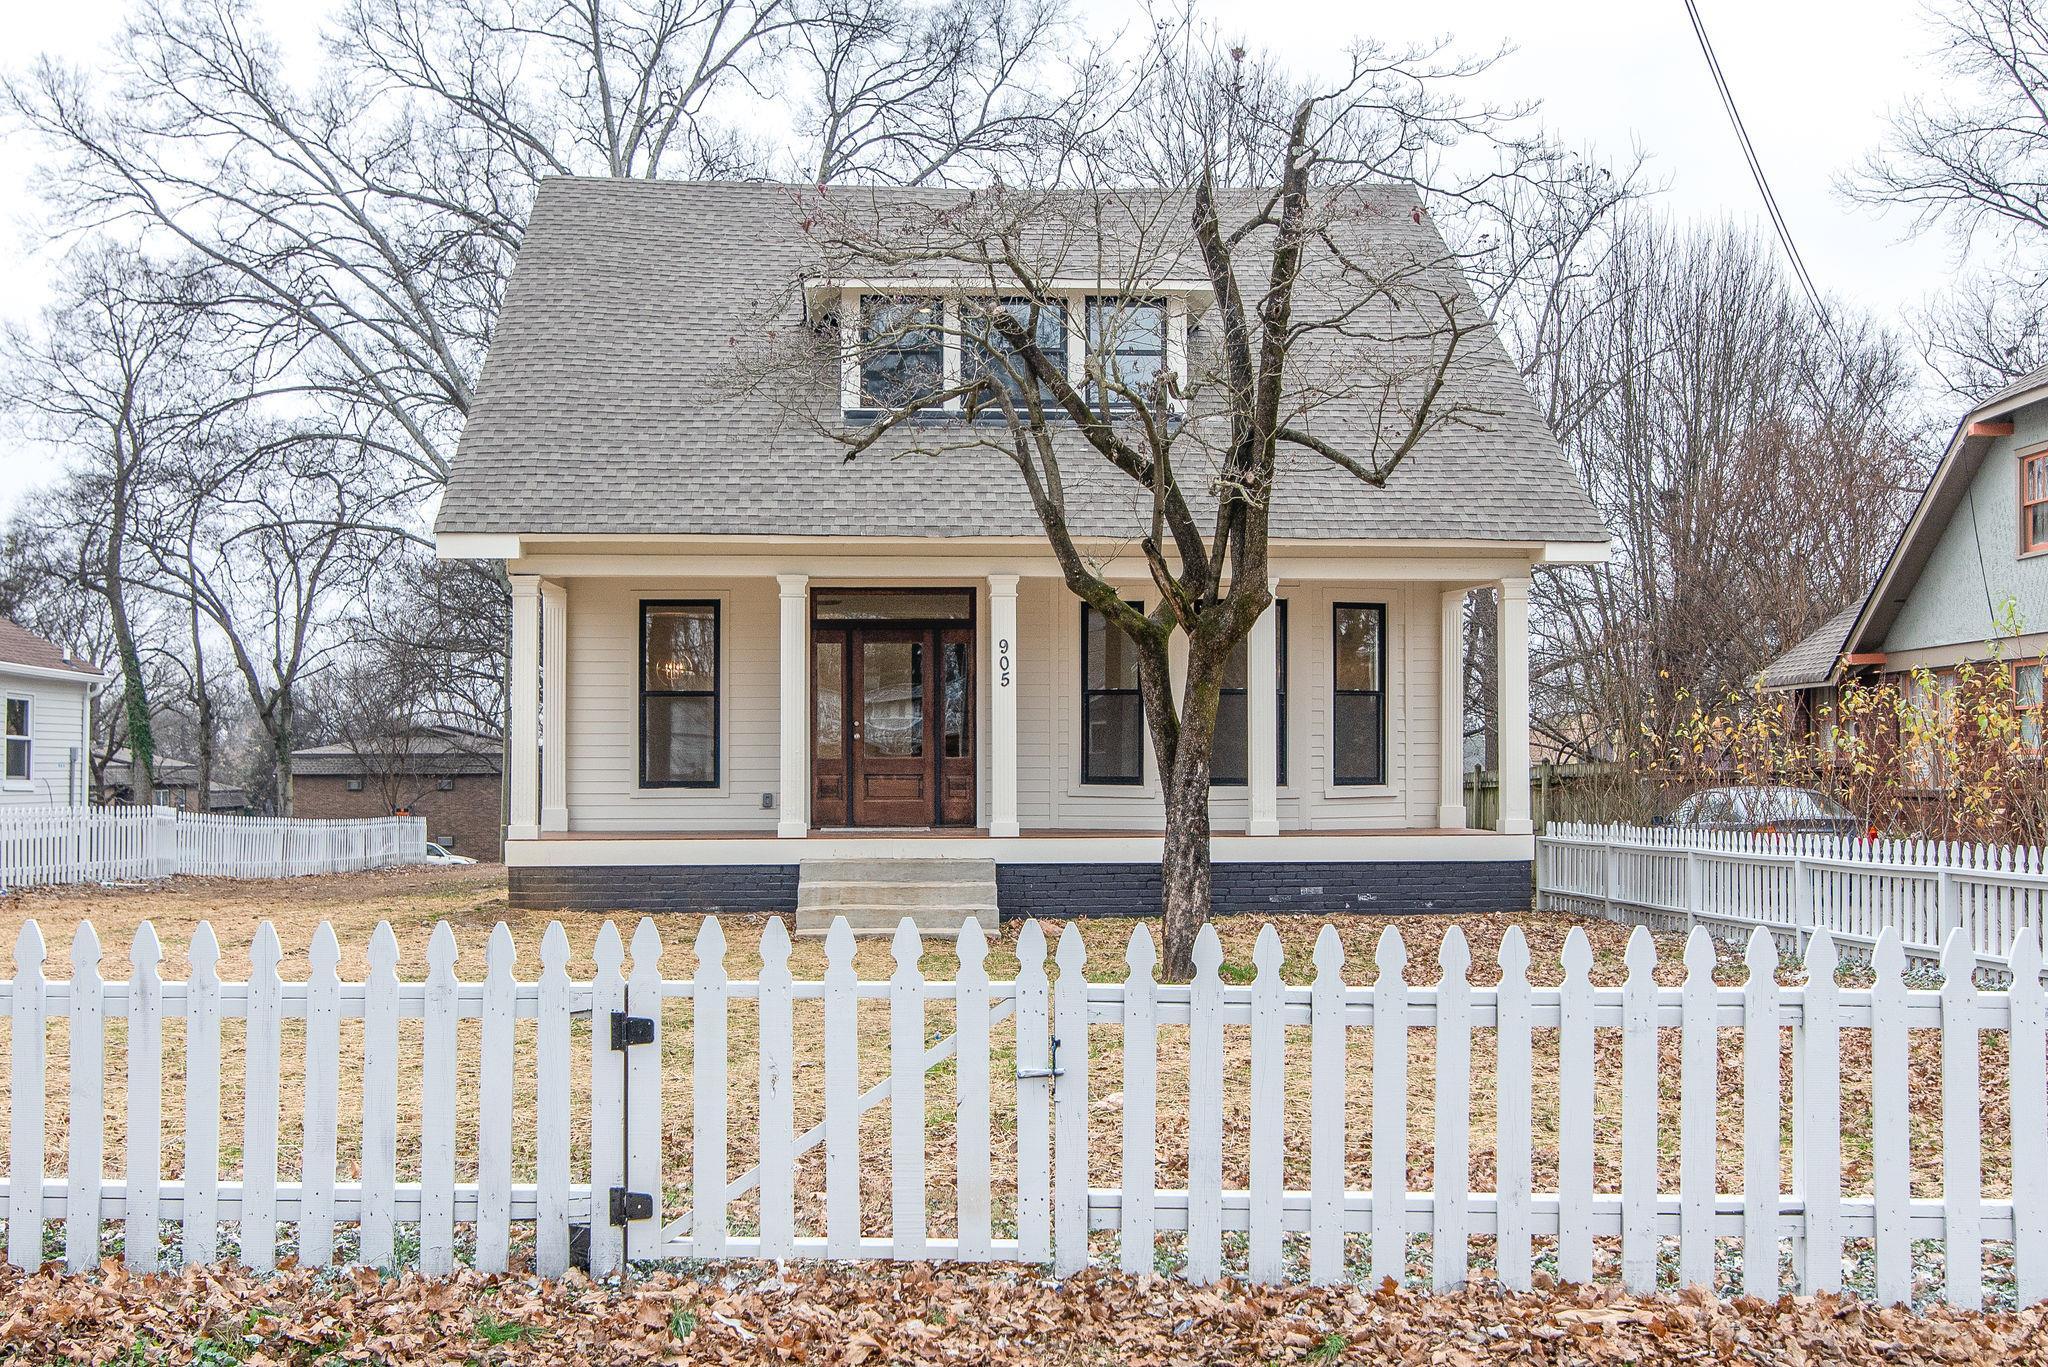 905 N 14Th St, Nashville, TN 37206 - Nashville, TN real estate listing